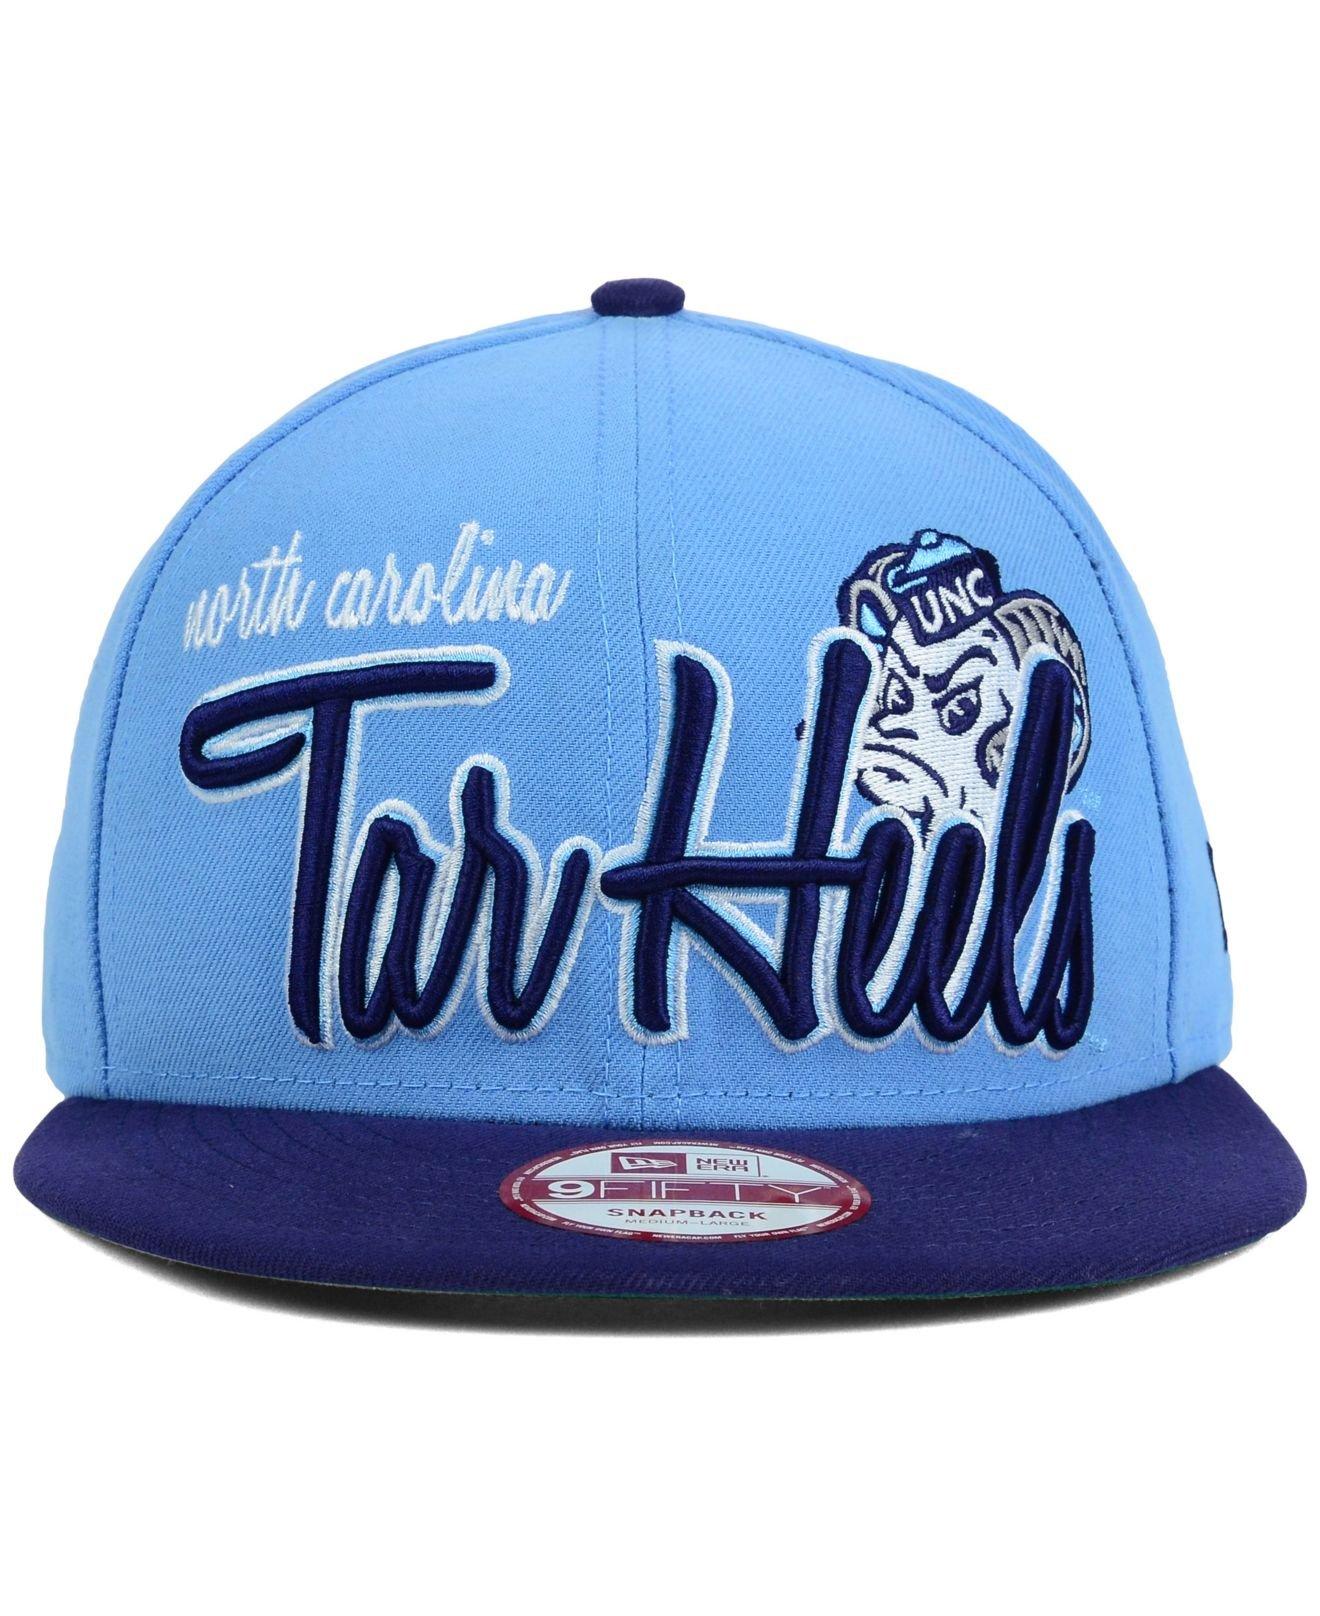 best cheap ad8f5 93068 KTZ North Carolina Tar Heels Team Script 9Fifty Snapback Cap in Blue ...